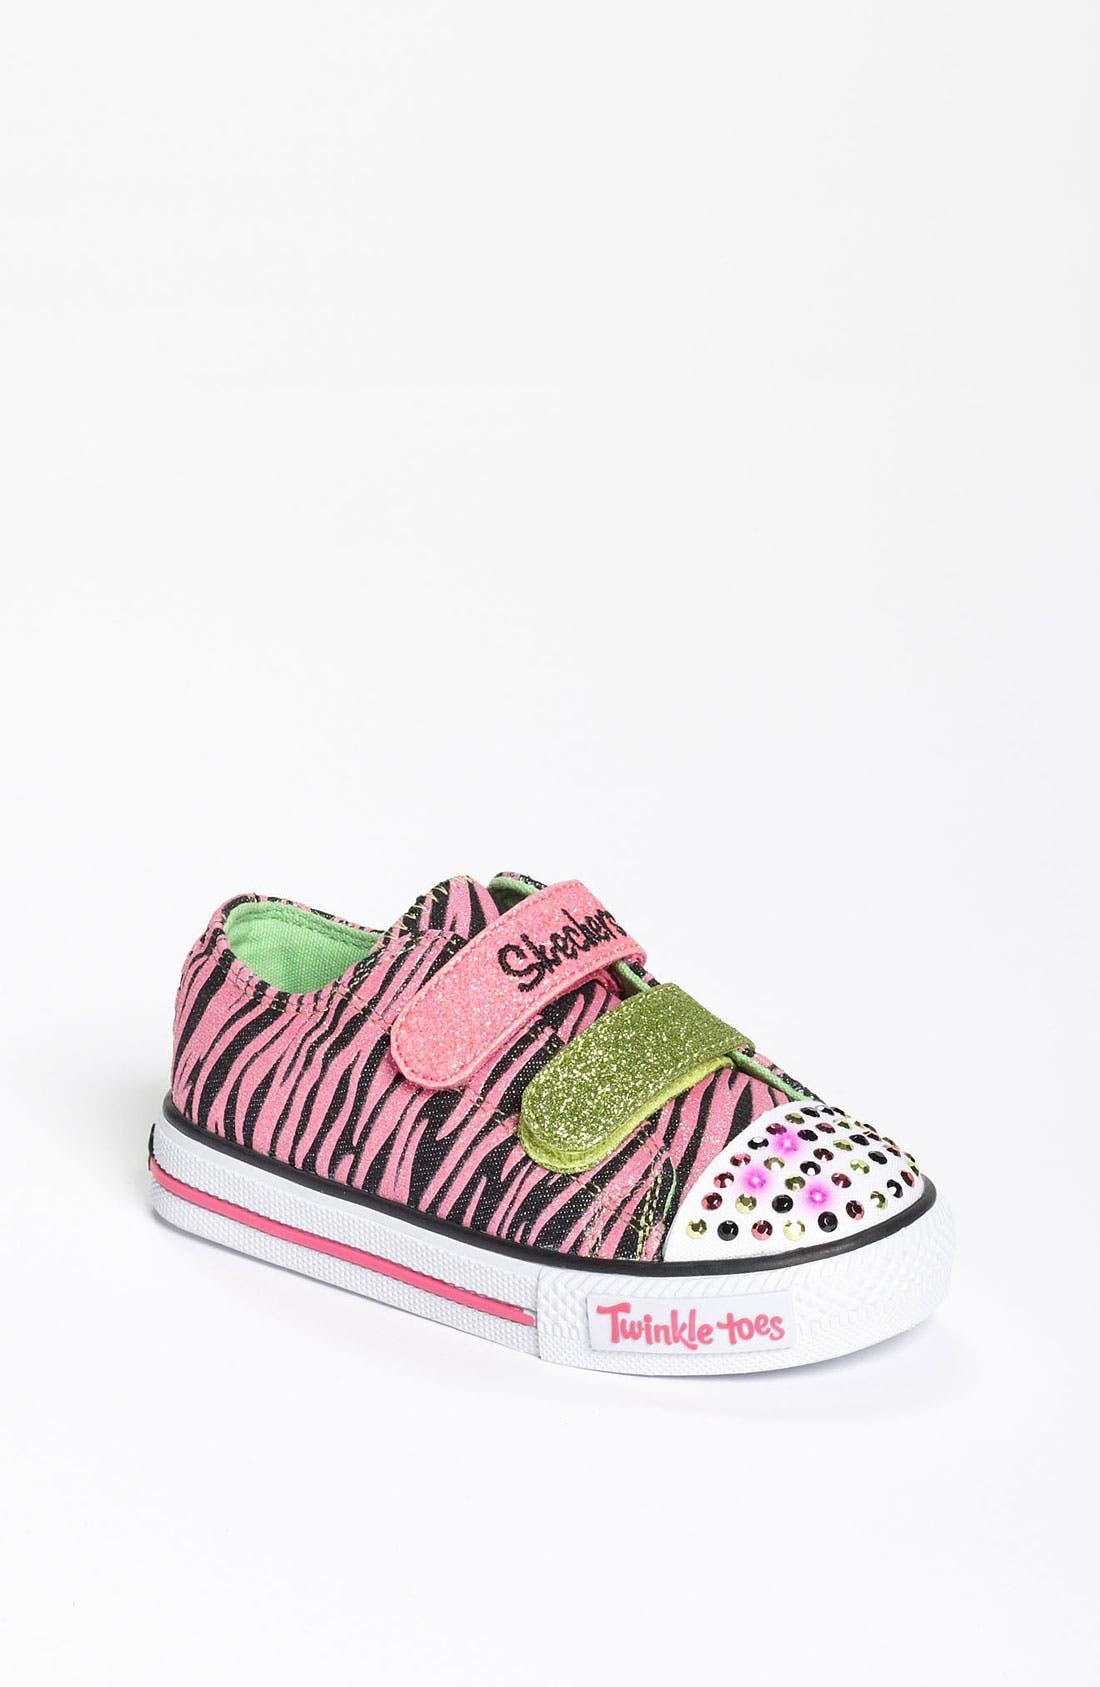 Alternate Image 1 Selected - SKECHERS 'Twinkle Toes' Light-Up Sneaker (Walker & Toddler)(Nordstrom Exclusive)